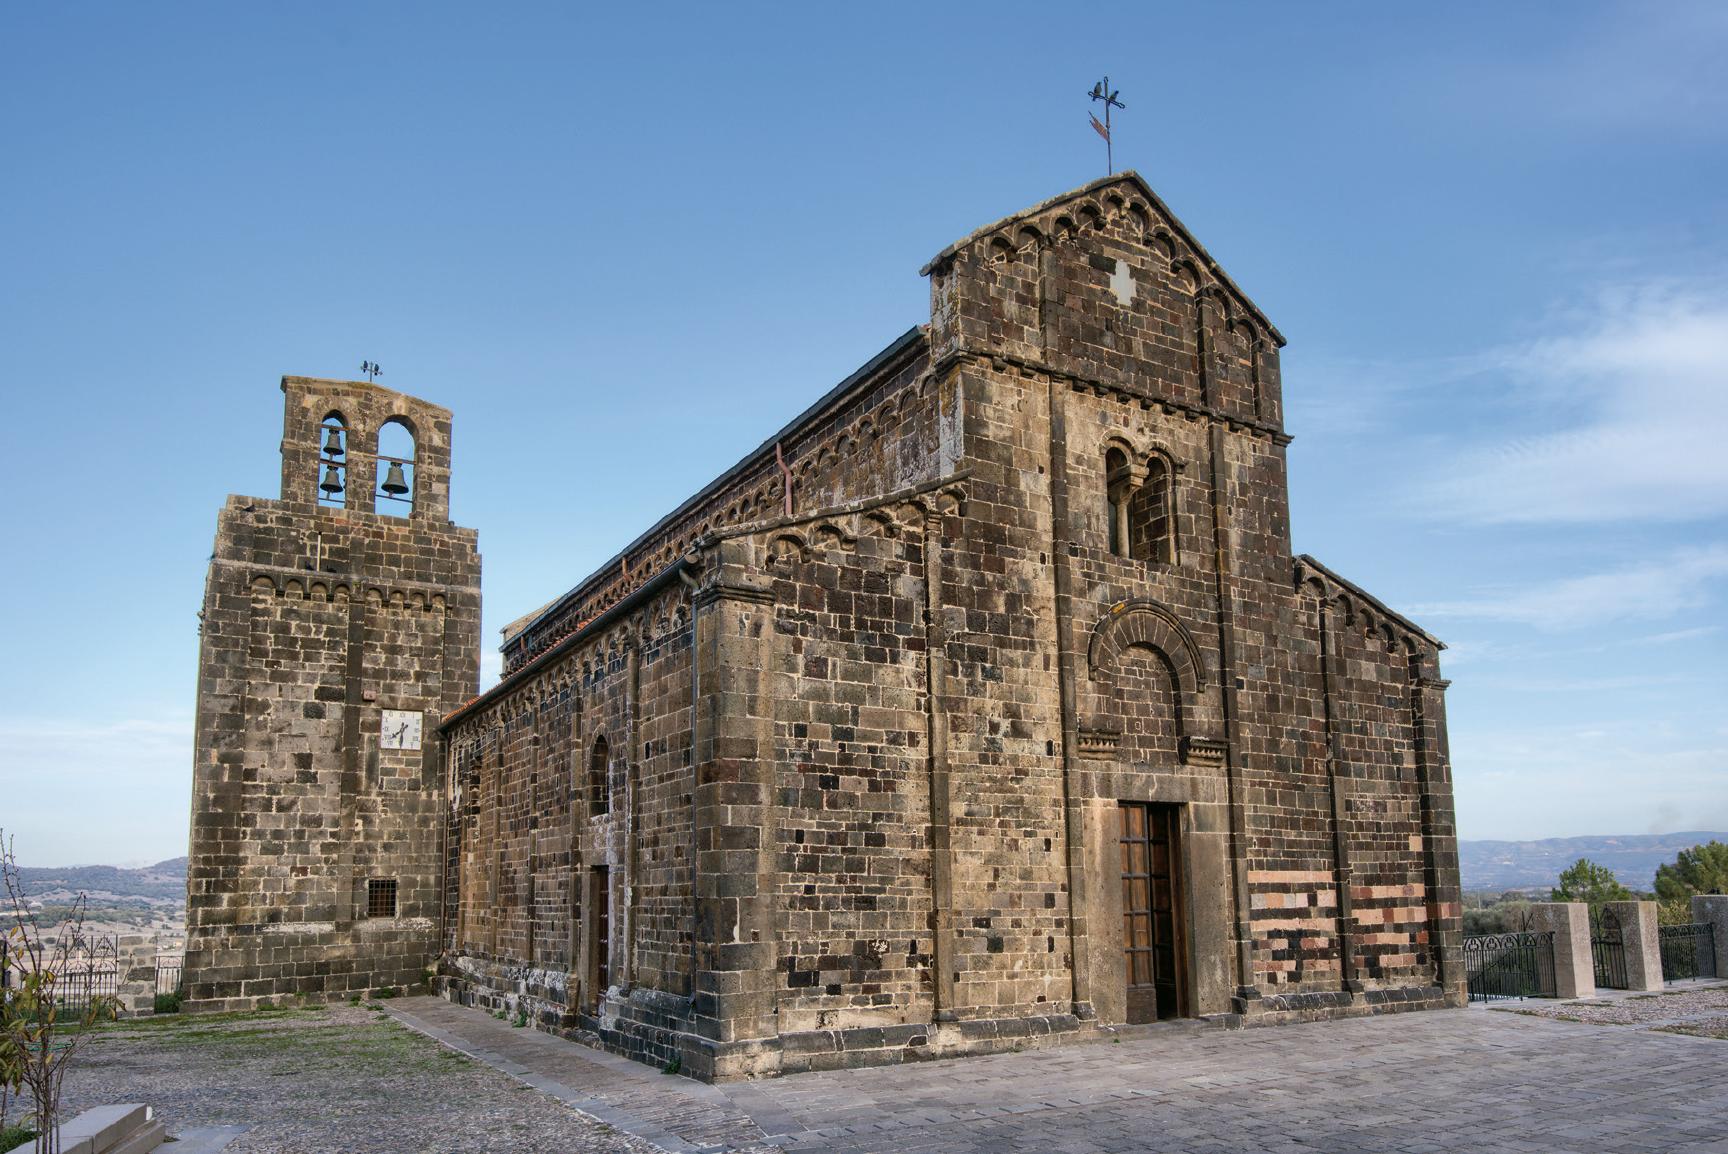 Santa Maria del Regno, façade. Ardara (Sassari)